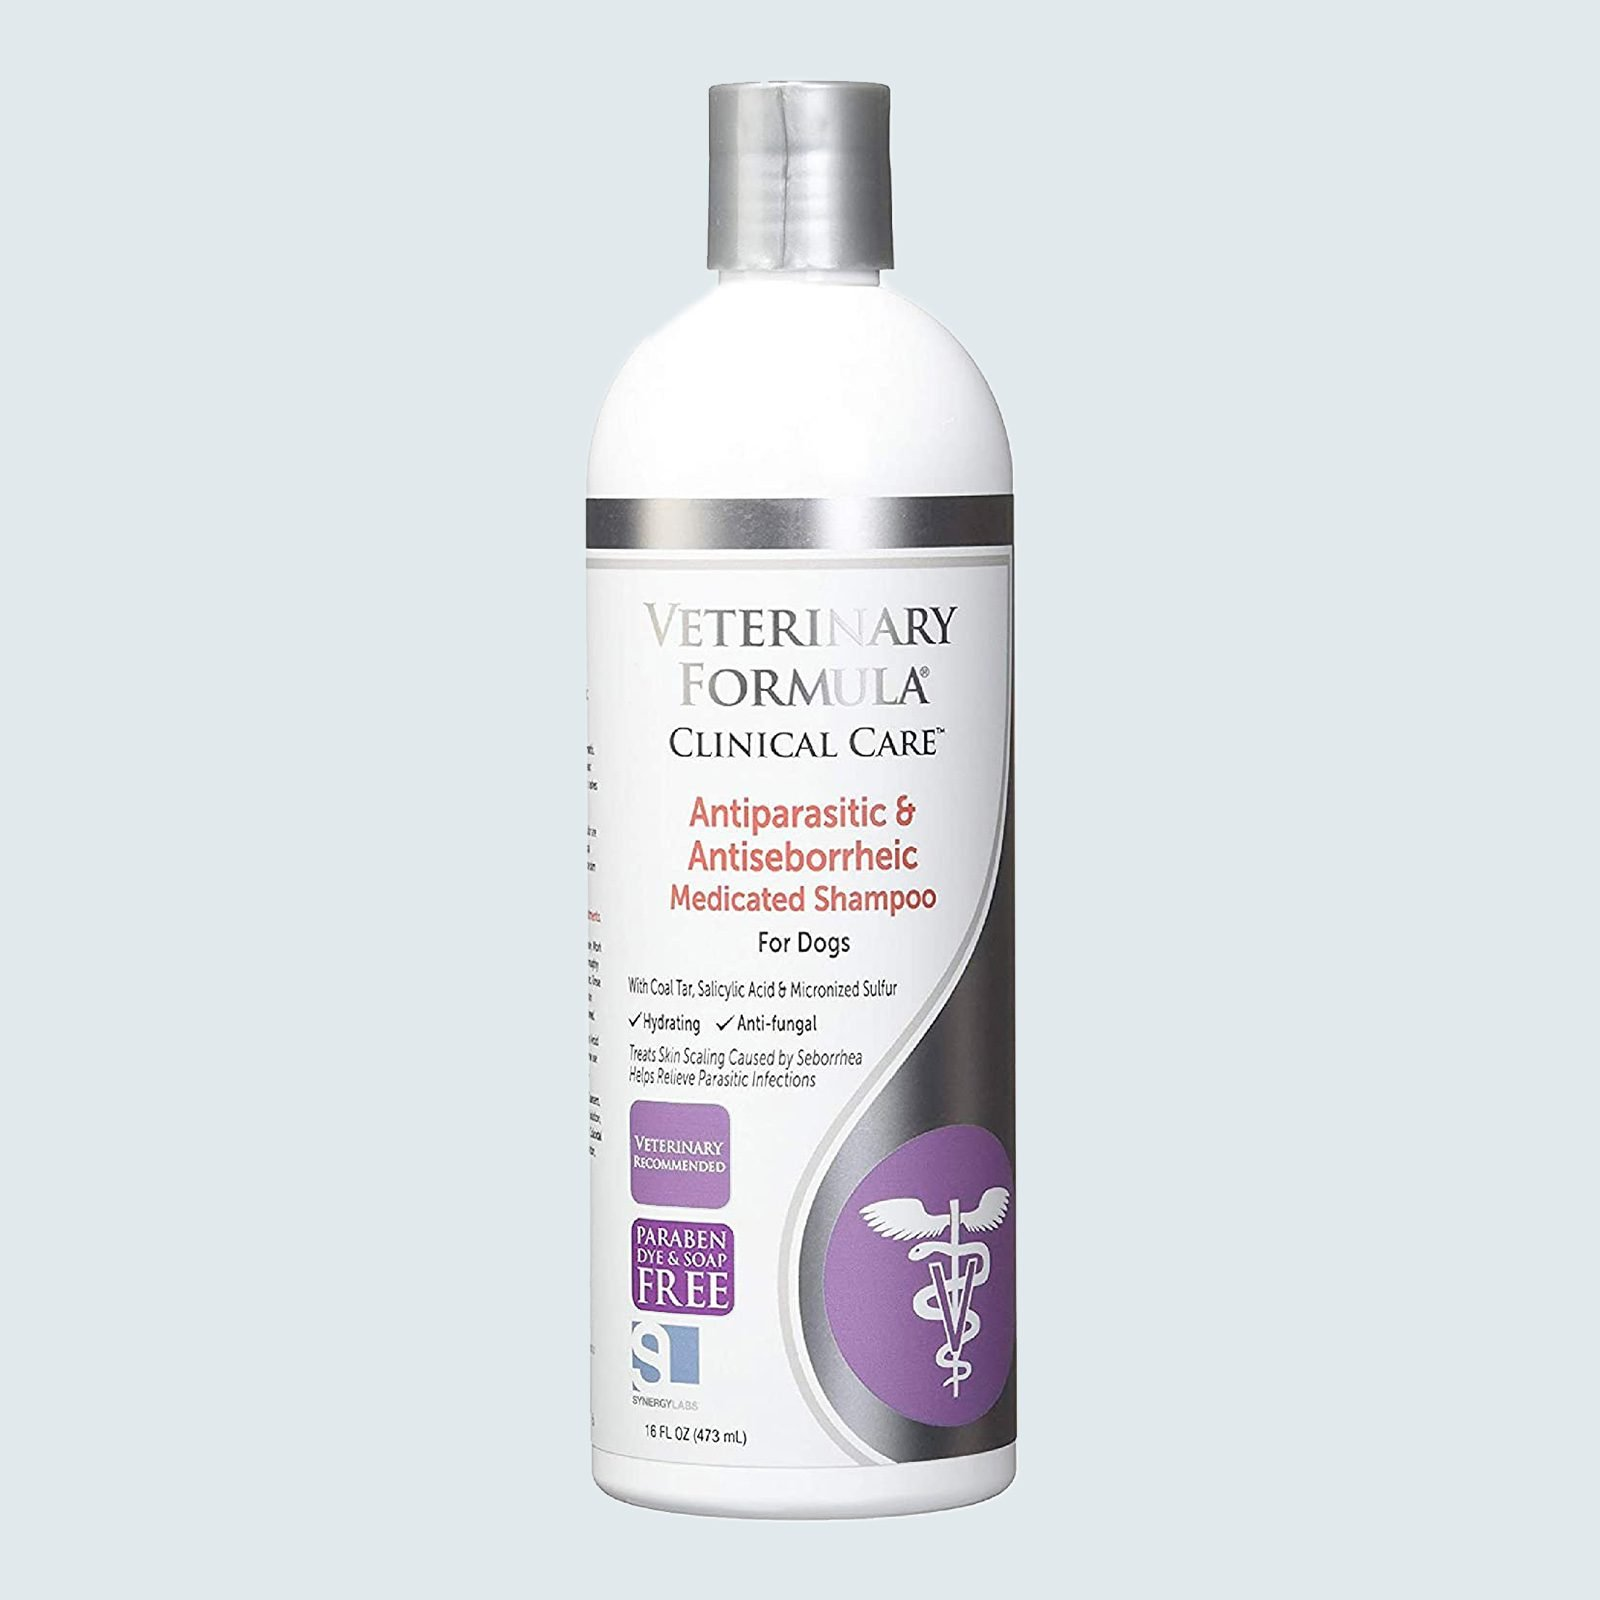 Veterinary Formula Clinical Care Antiparasitic & Antiseborrheic Medicated Shampoo